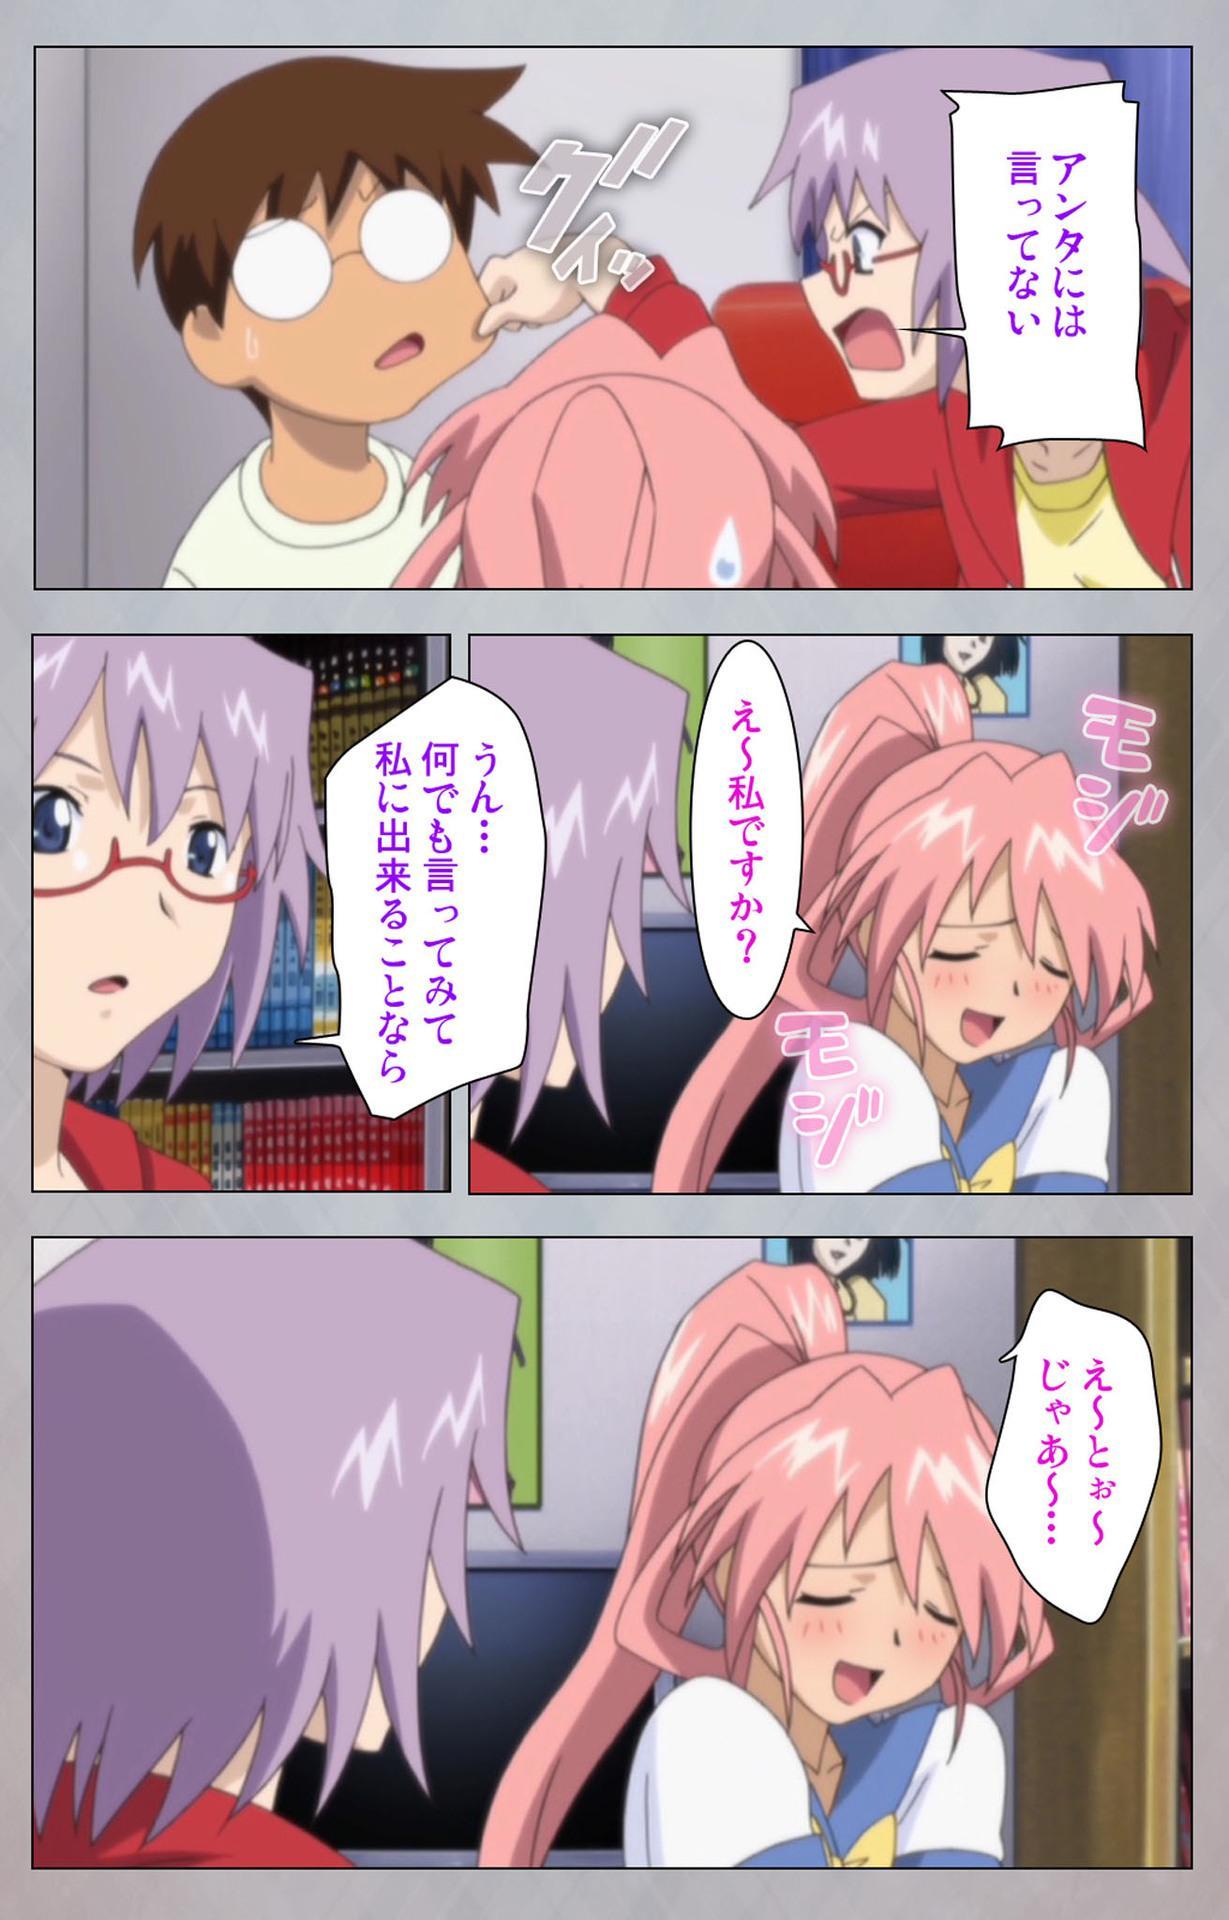 [Digital Works] [Full Color Seijin Ban] Sex Android ~Risou no Onna de Nuite yaru~ Kanzenban 195